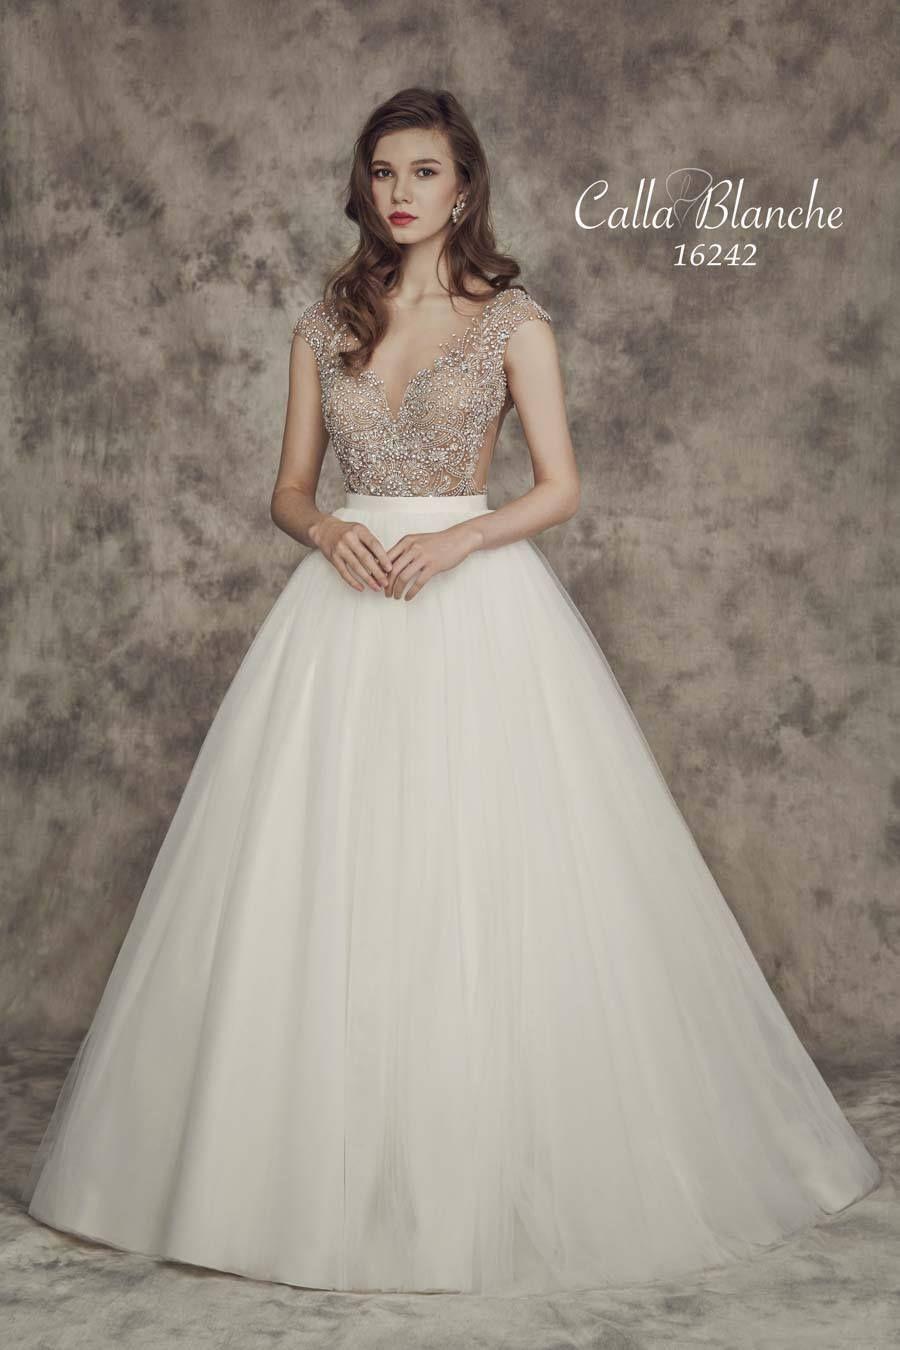 CALLA BLANCHE Carrie Wedding Dress Style 16242 | Calla Blanche ...